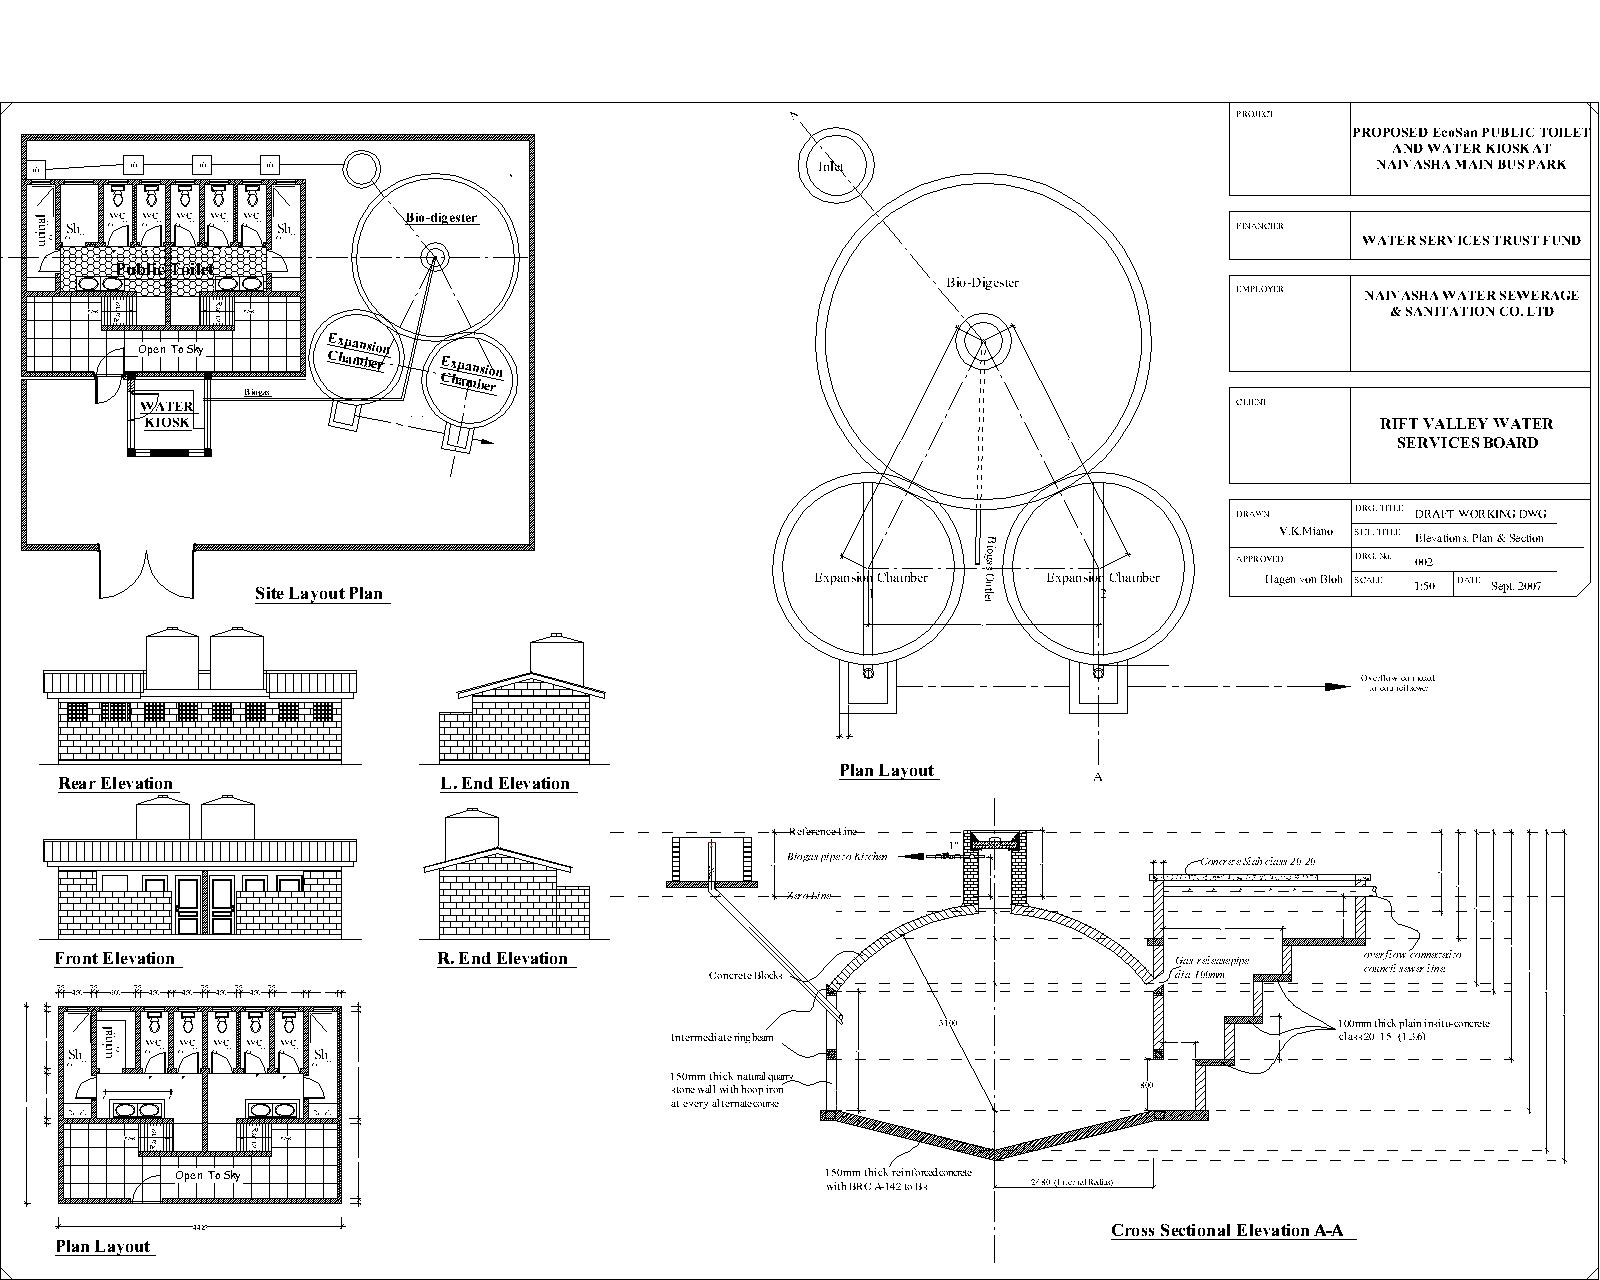 File 30 Naivasha EcoSan Biogas Public Toilet Drawing 4426405397 Jpg Wikim